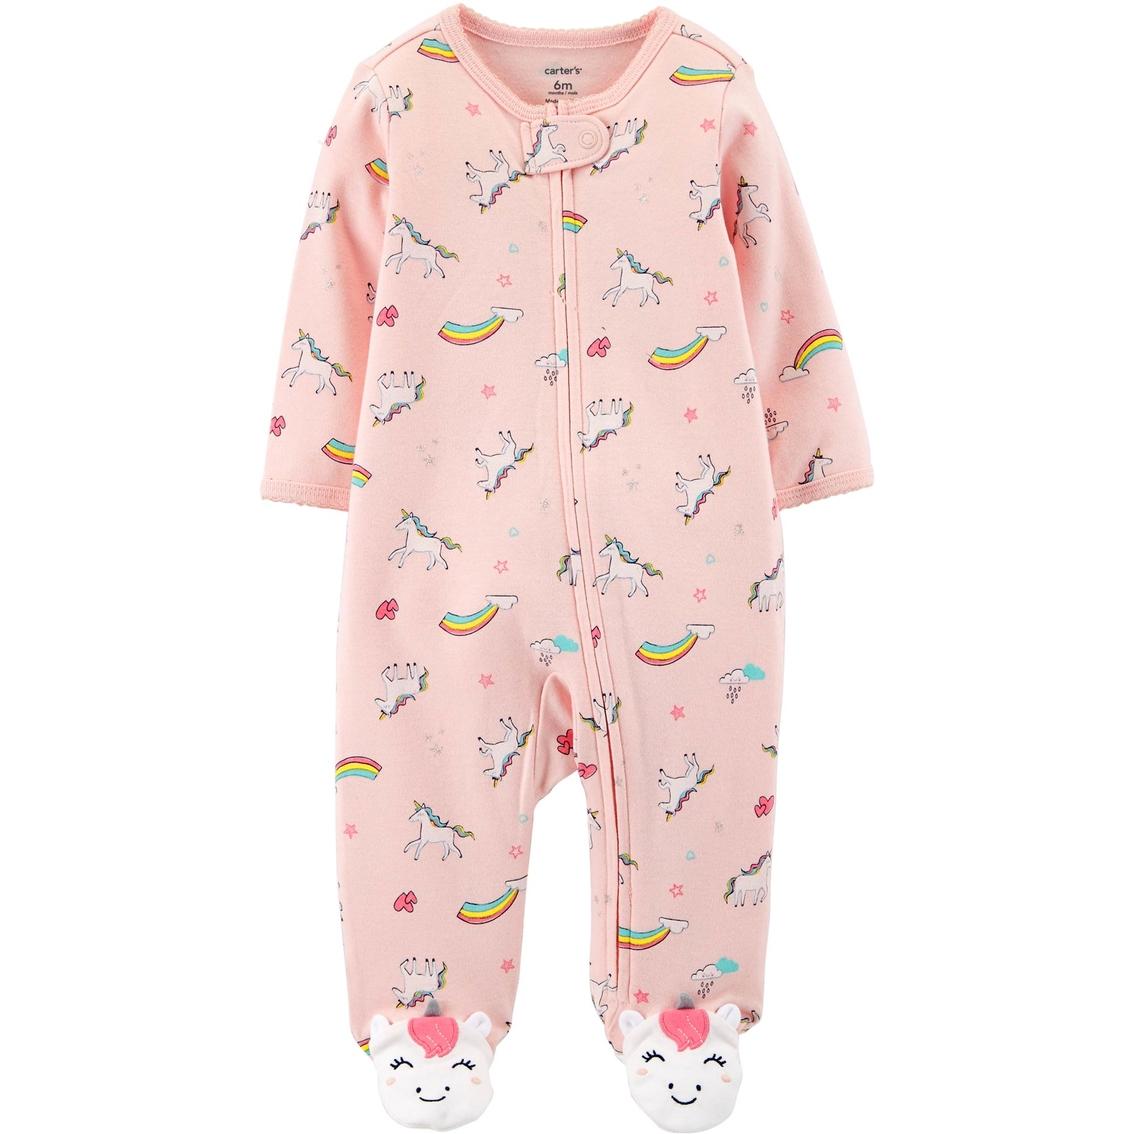 4807b00a7987 Carter s Infant Girls Unicorn Zip-up Cotton Sleep And Play Pajamas ...